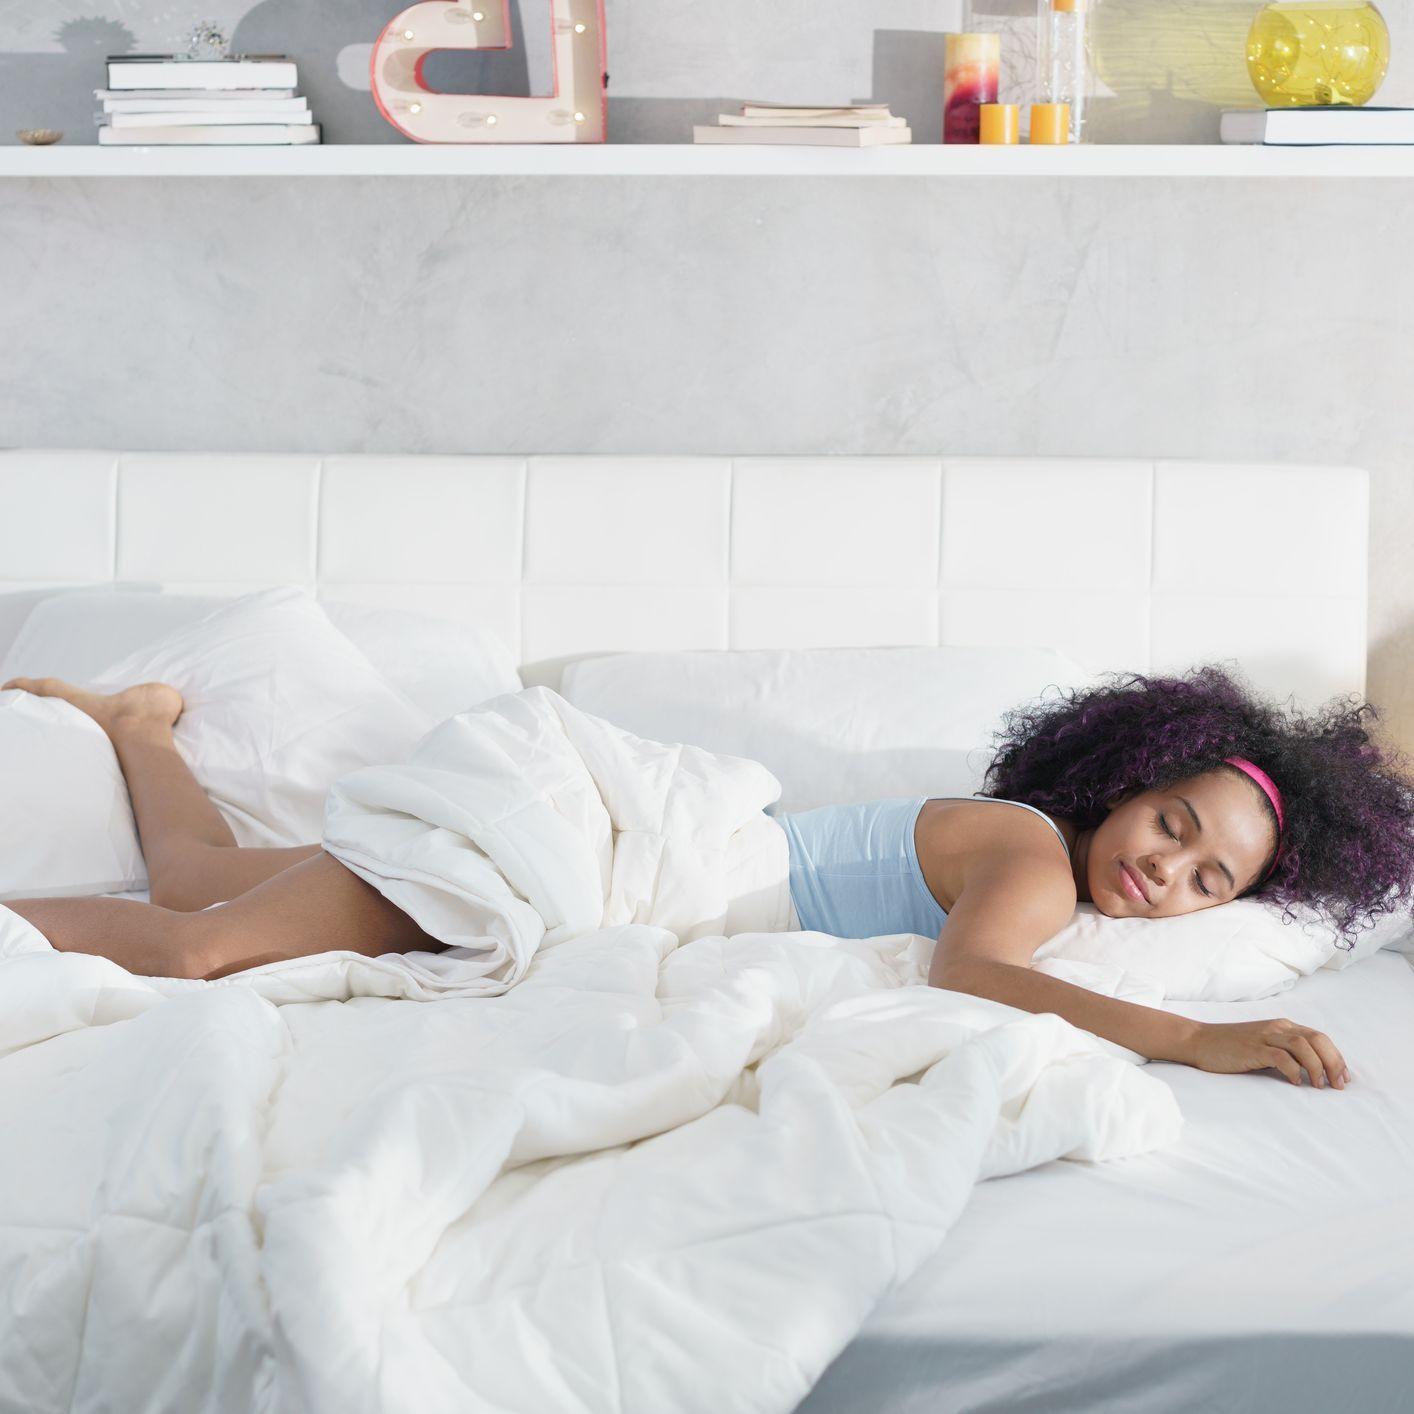 An Alaska King Bed Is Even Bigger Than a California King